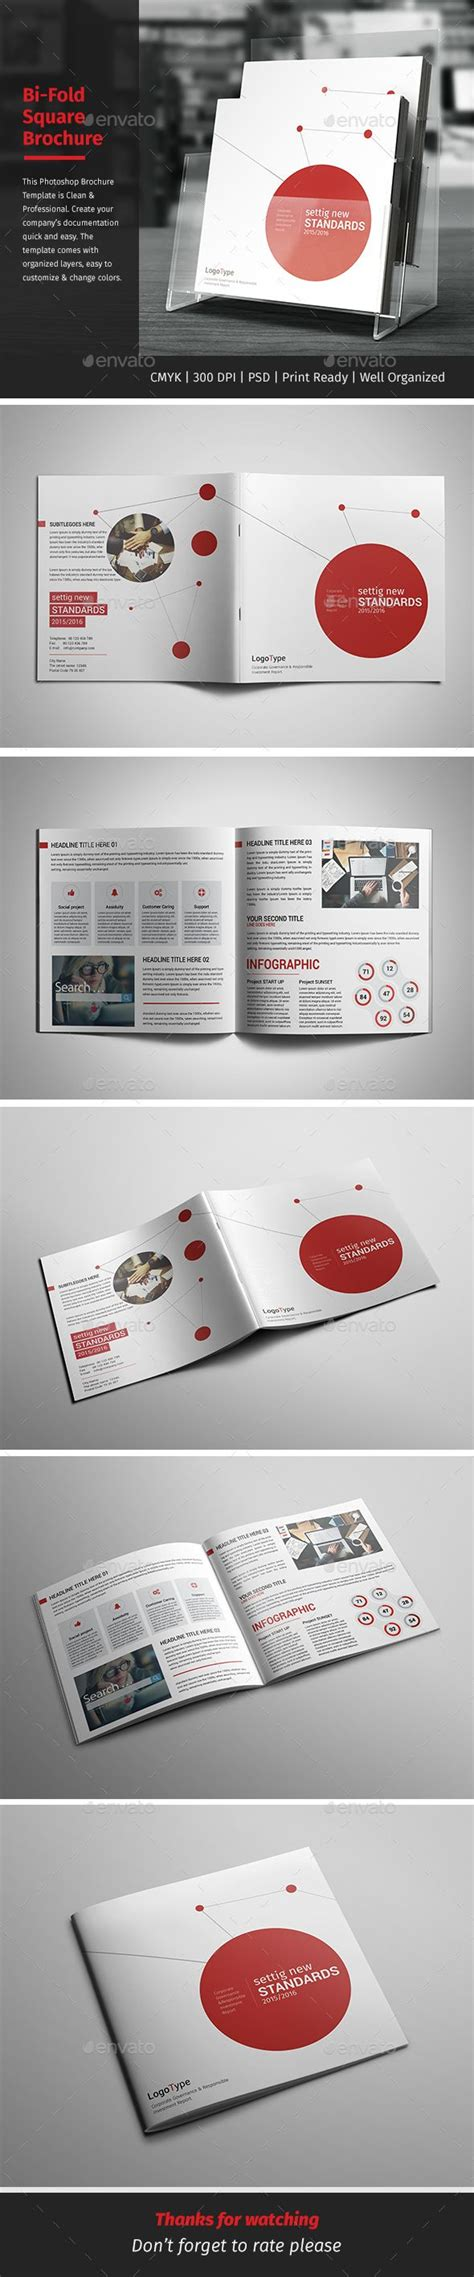 visitor pattern fold 3730 best images about dtp editorial design on pinterest